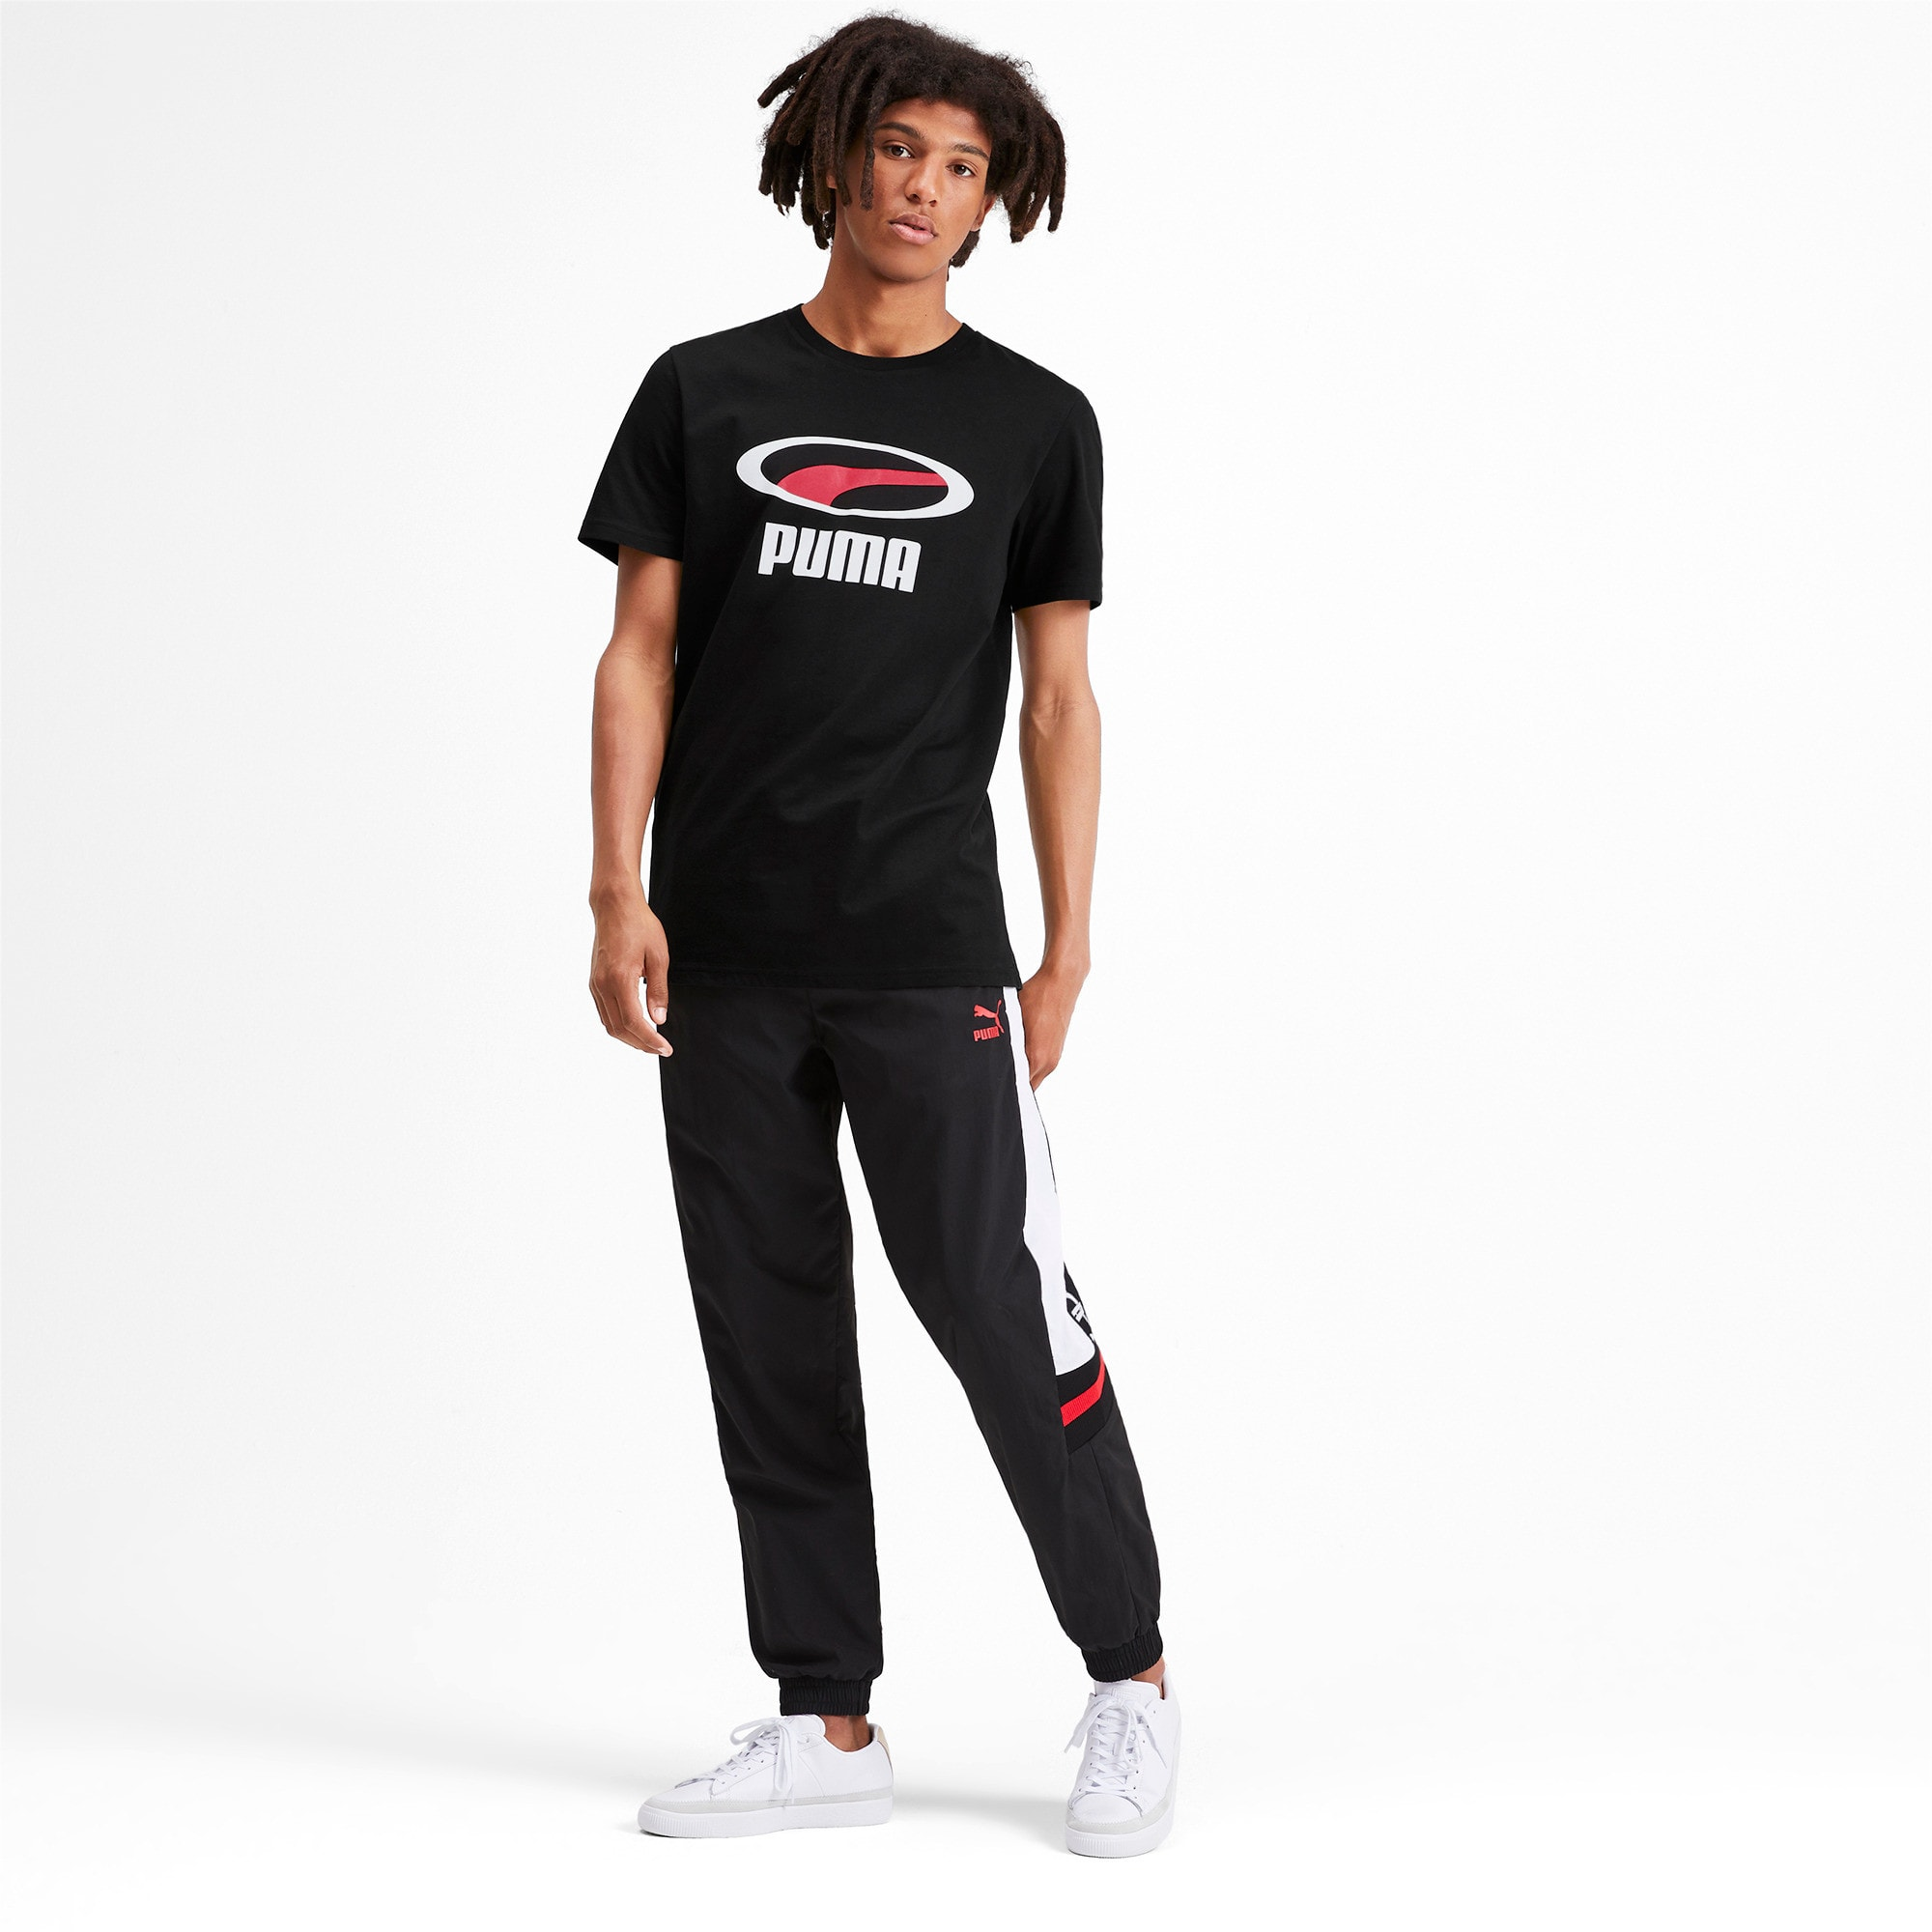 Thumbnail 3 of PUMA XTG グラフィック SS Tシャツ, Puma Black, medium-JPN